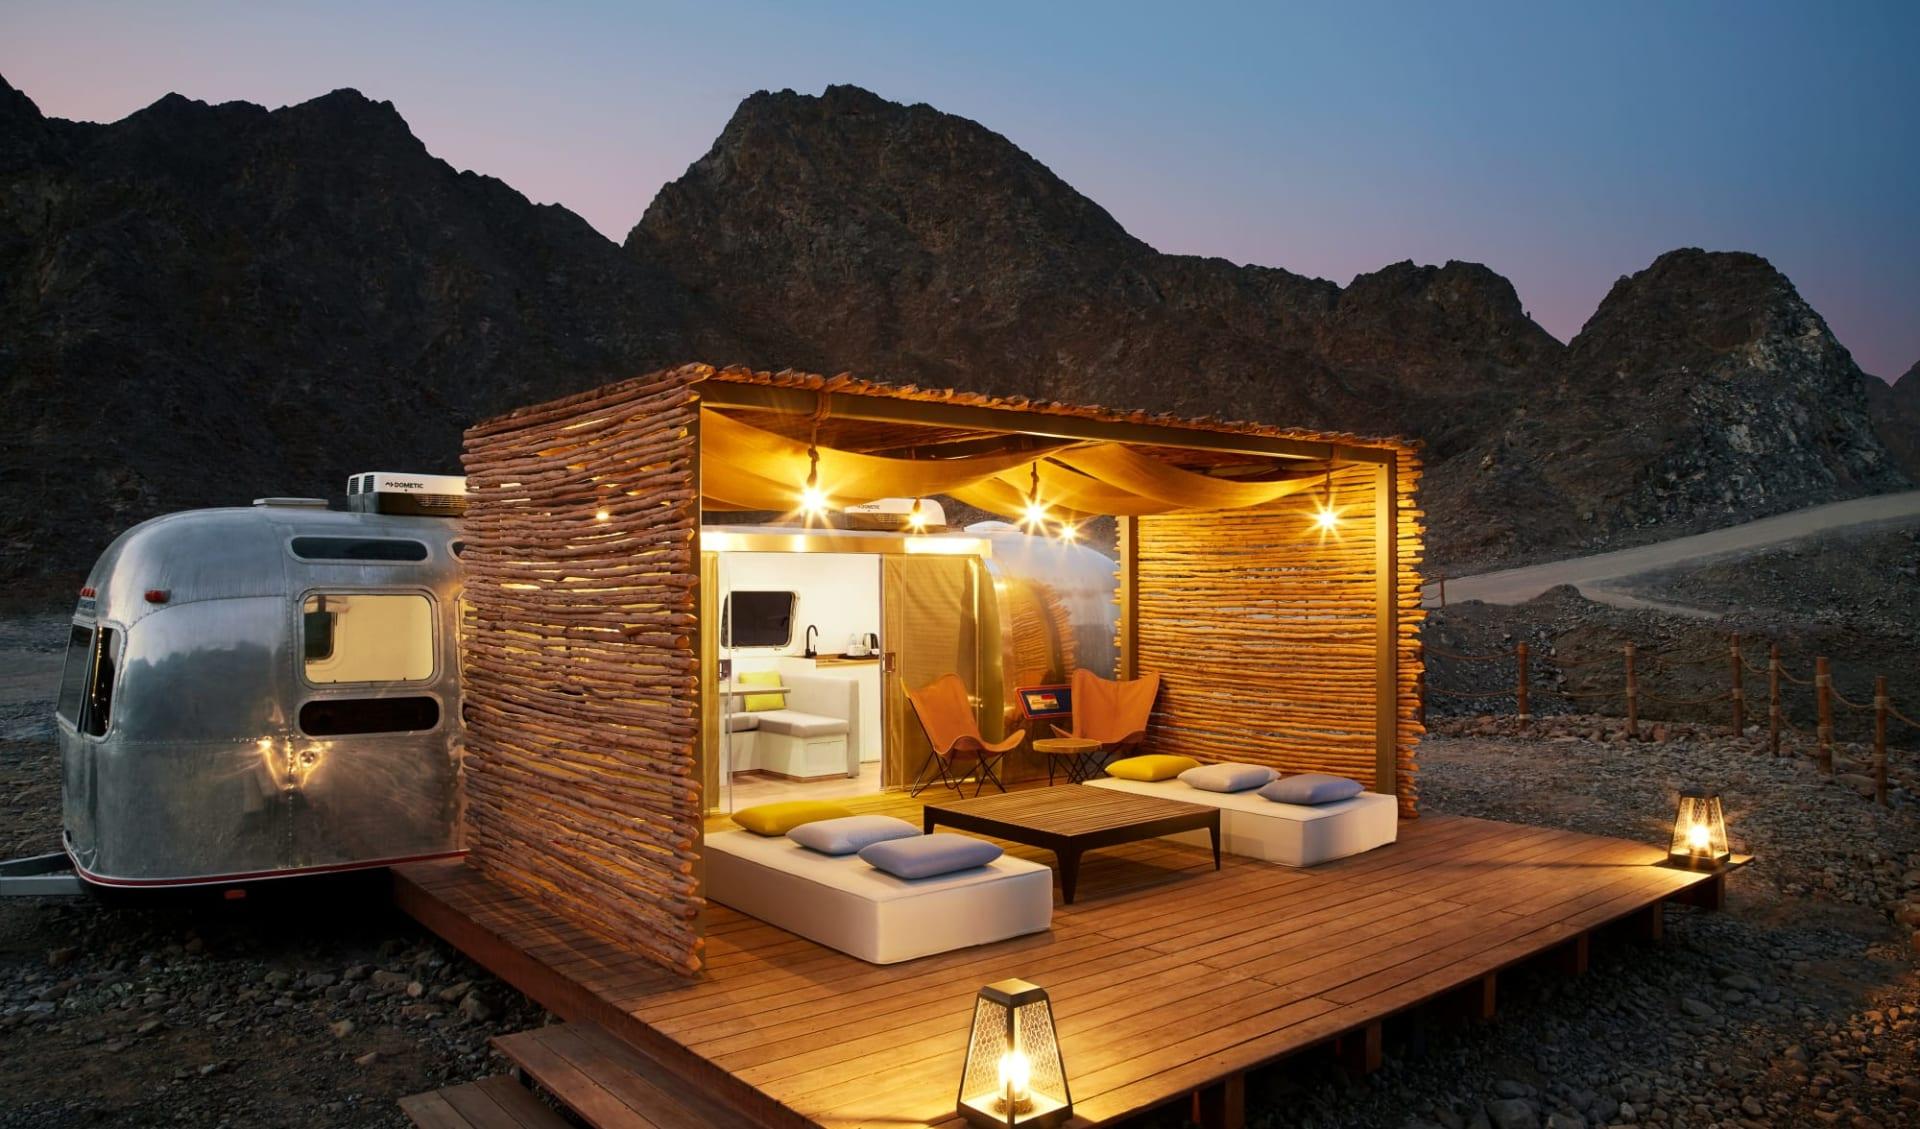 Sedr Trailers Resort in Hatta: